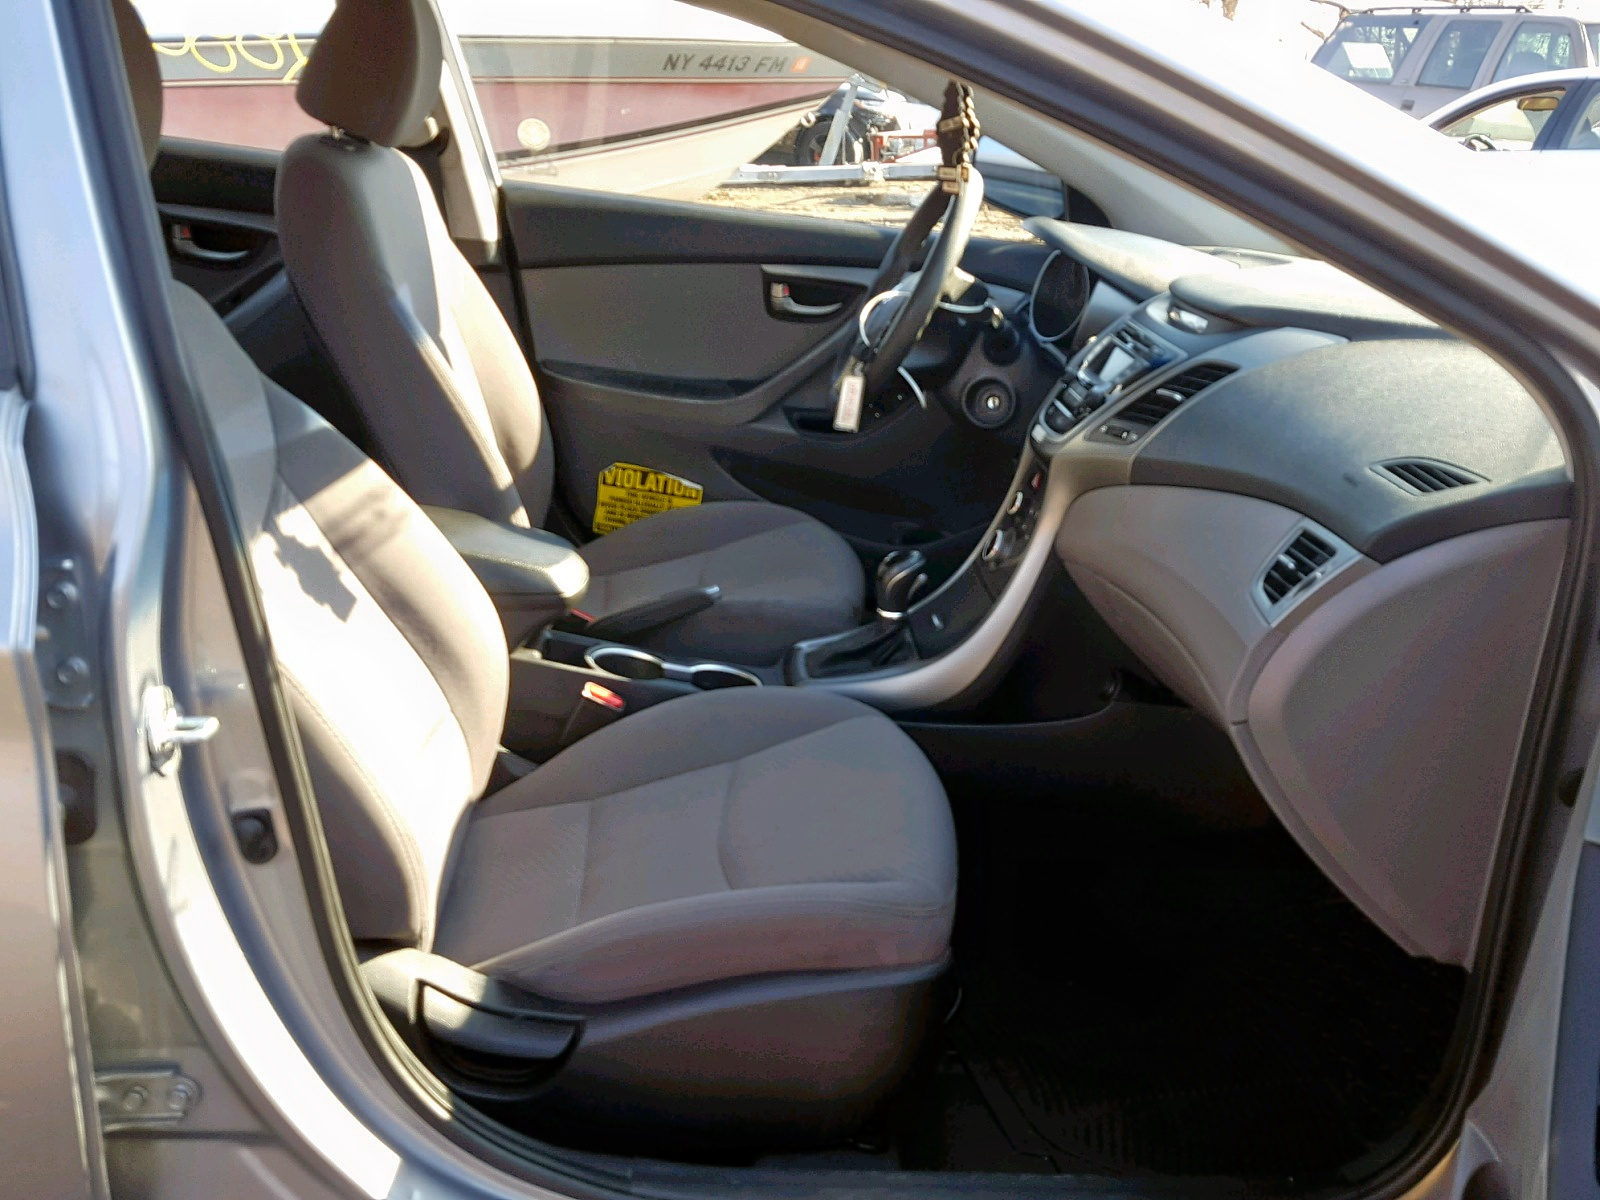 2016 Hyundai Elantra Se 1.8L close up View